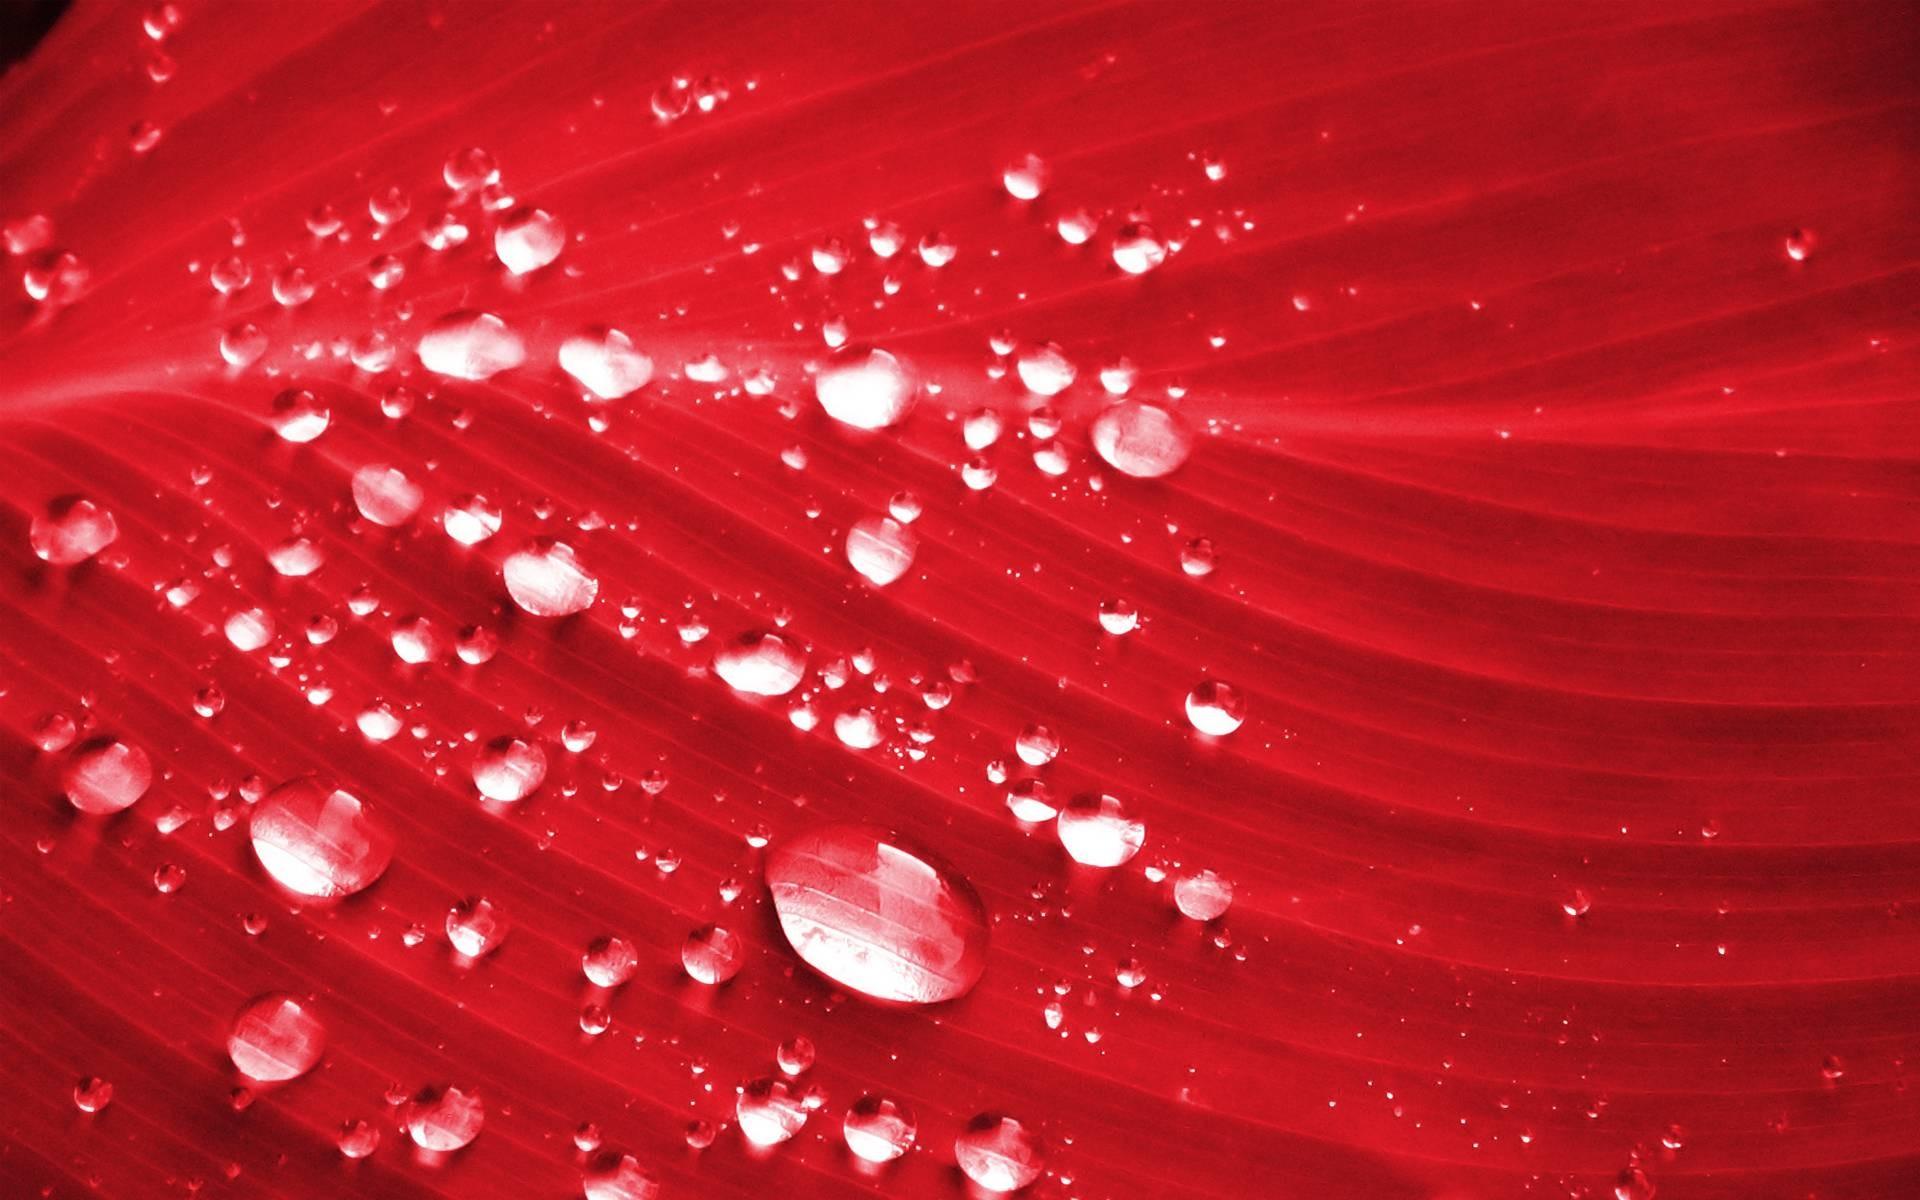 Red wallpaper hd download free backgrounds for desktop - Water wallpaper hd download ...